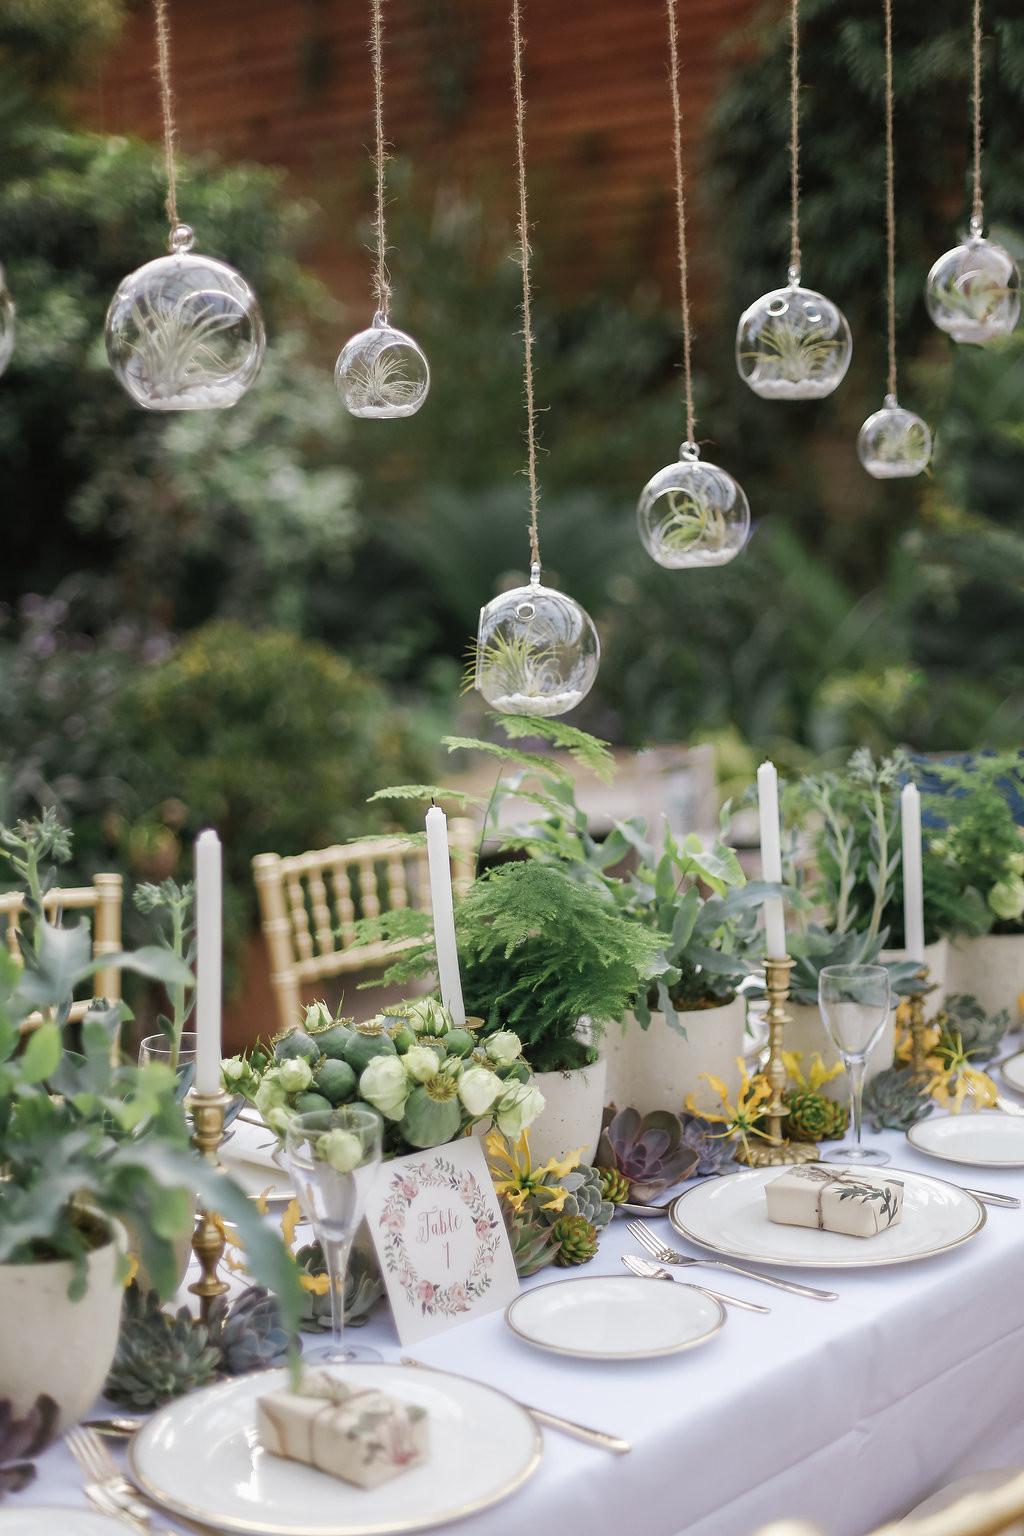 Wedding Table Decorations  18 Rustic Greenery Wedding Table Decorations You Will Love